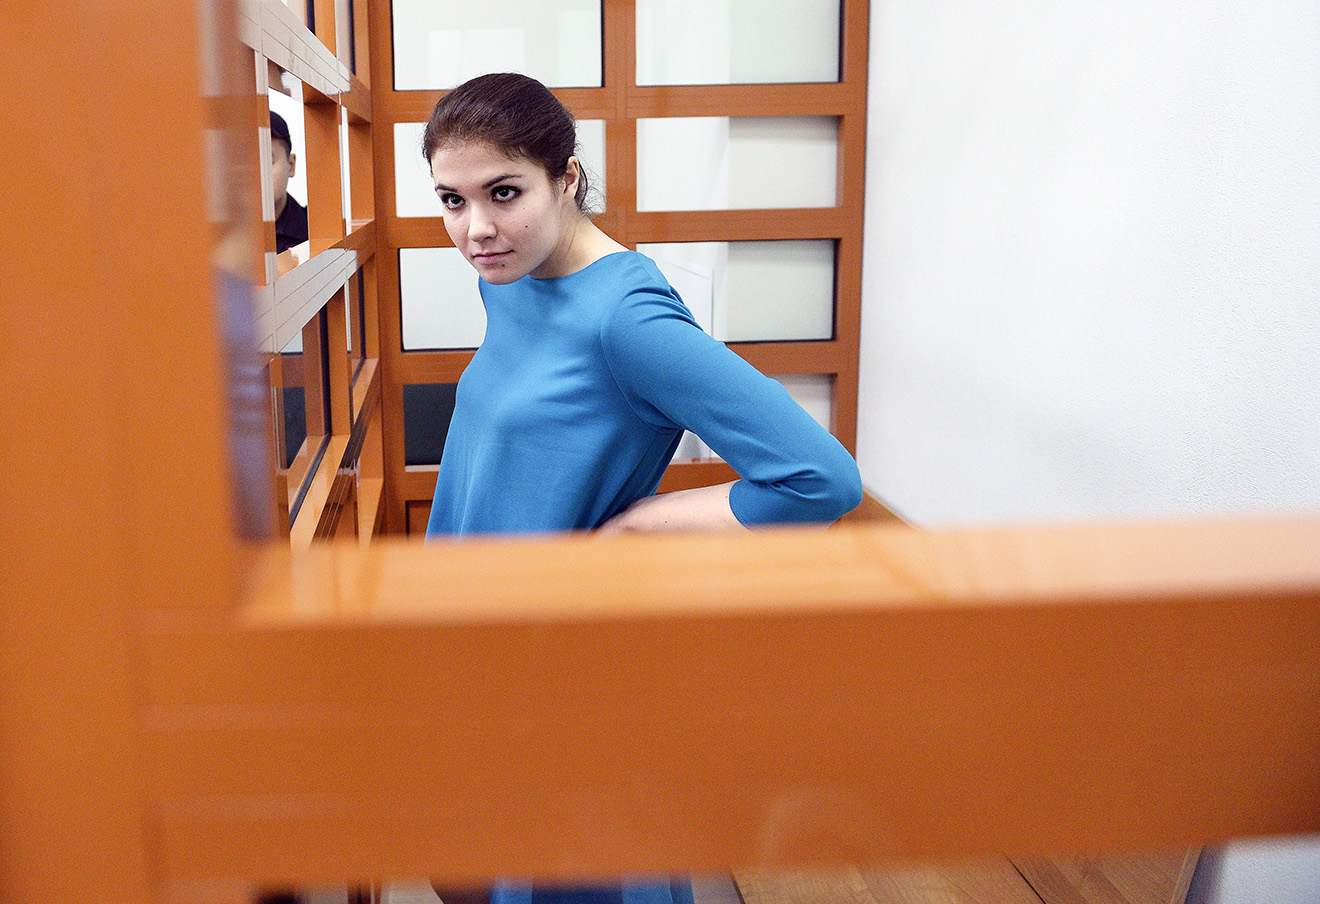 Варвара Караулова. Фото: Кристина Кормилицына / Коммерсантъ